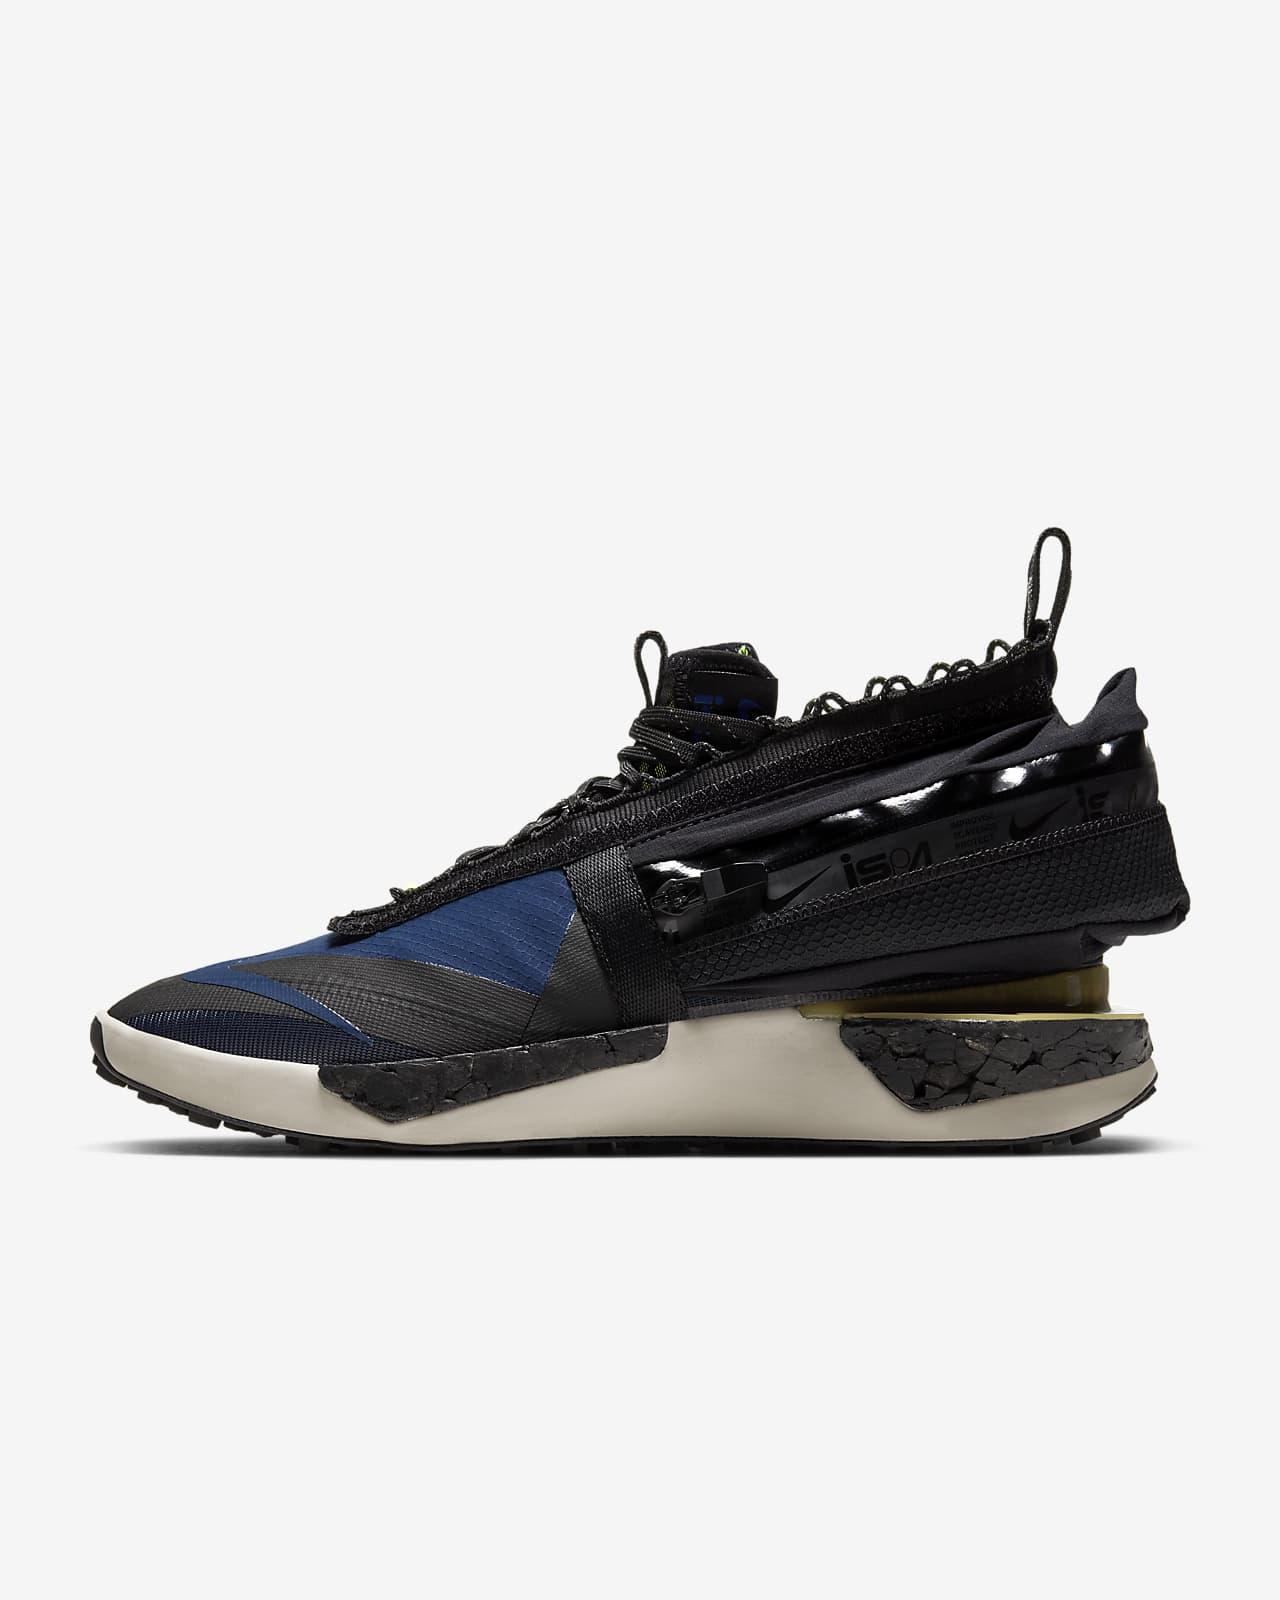 Nike ISPA Drifter Gator 鞋款